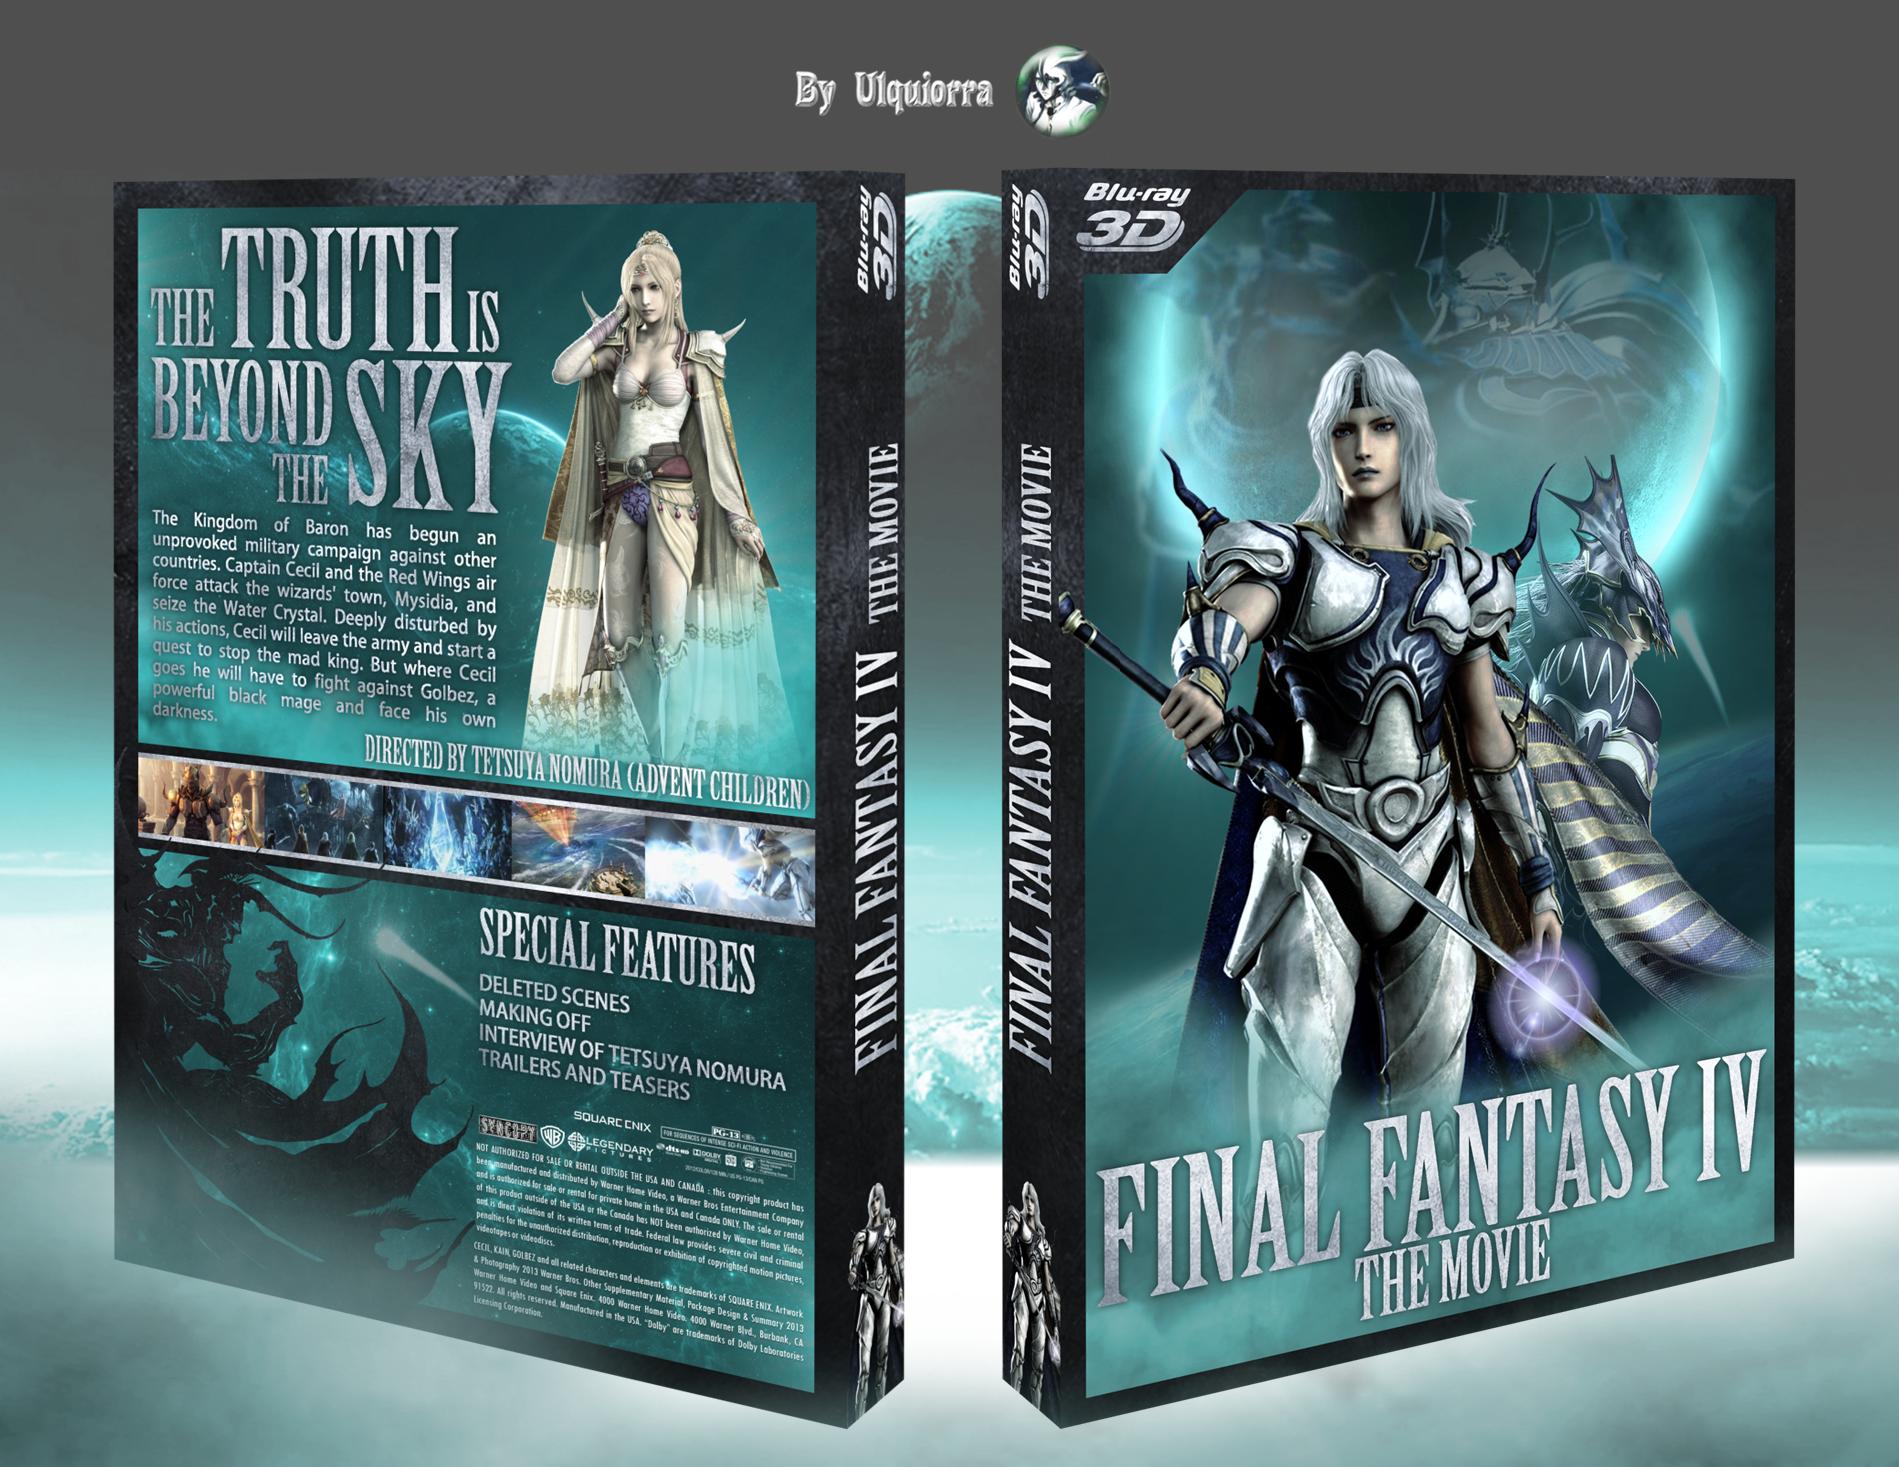 Final Fantasy Iv The Movie Box Art Cover Dvd Blu Ray